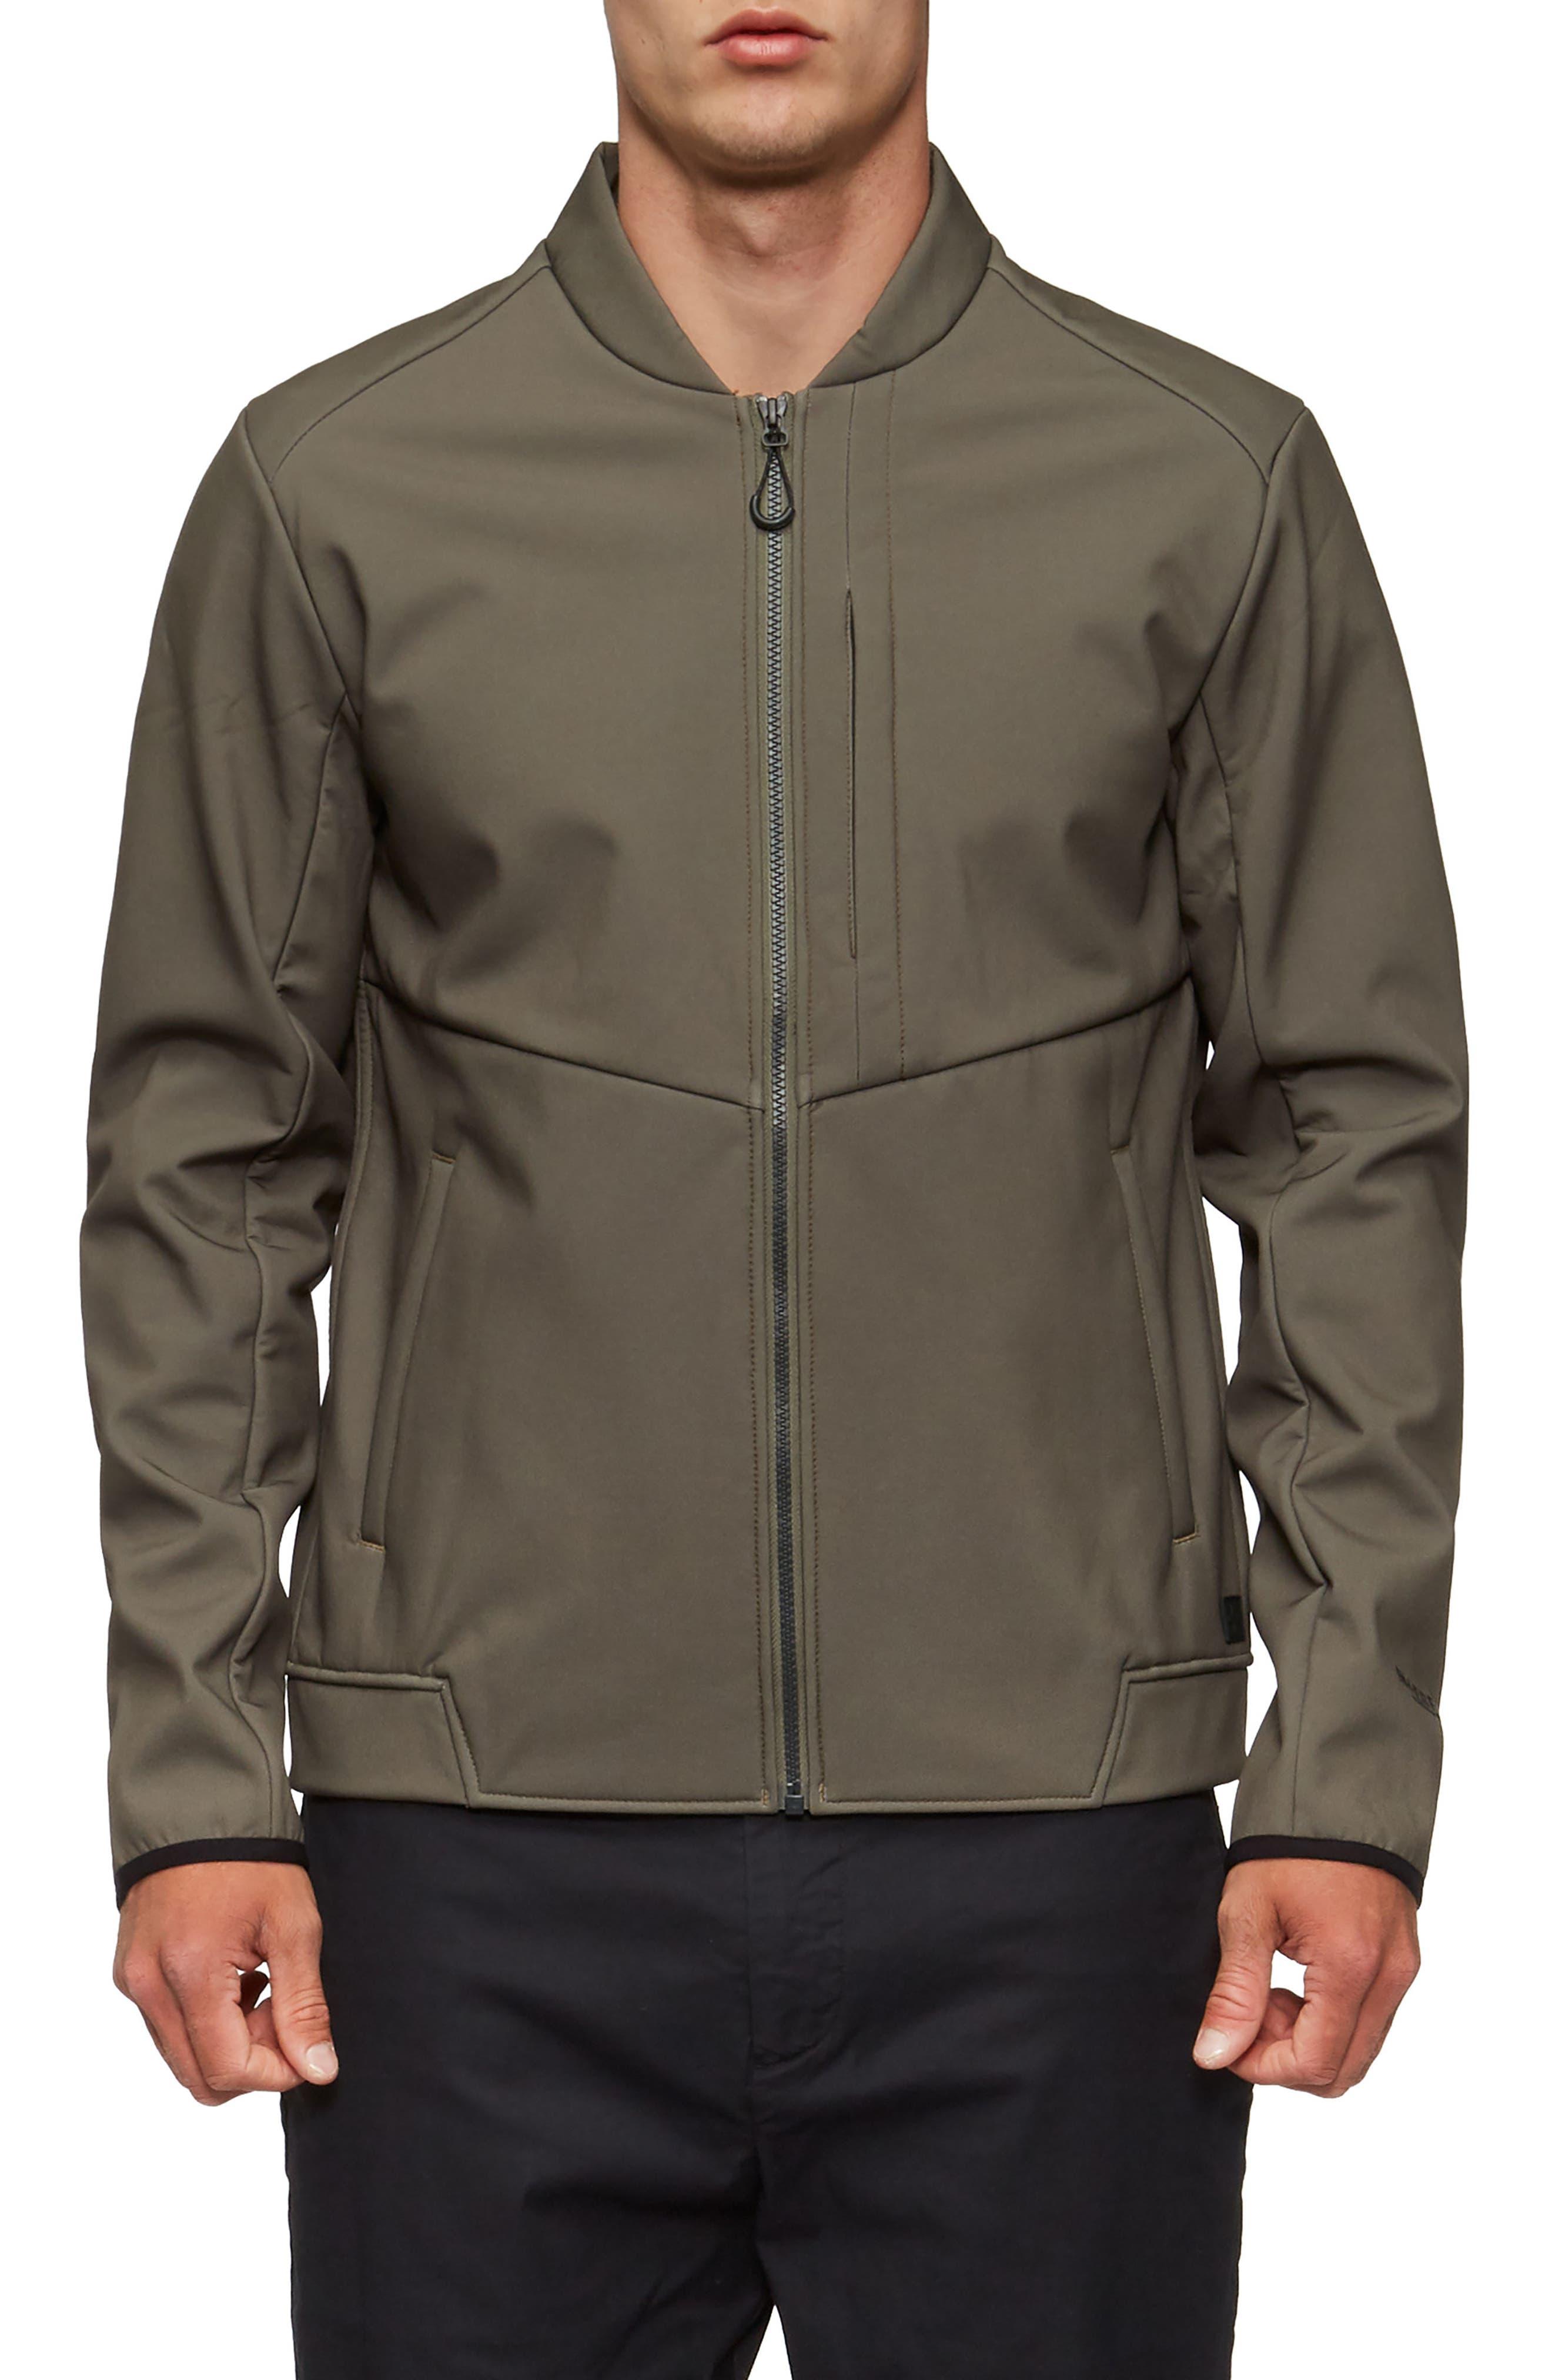 Decoy Fleece Jacket,                         Main,                         color, Olive